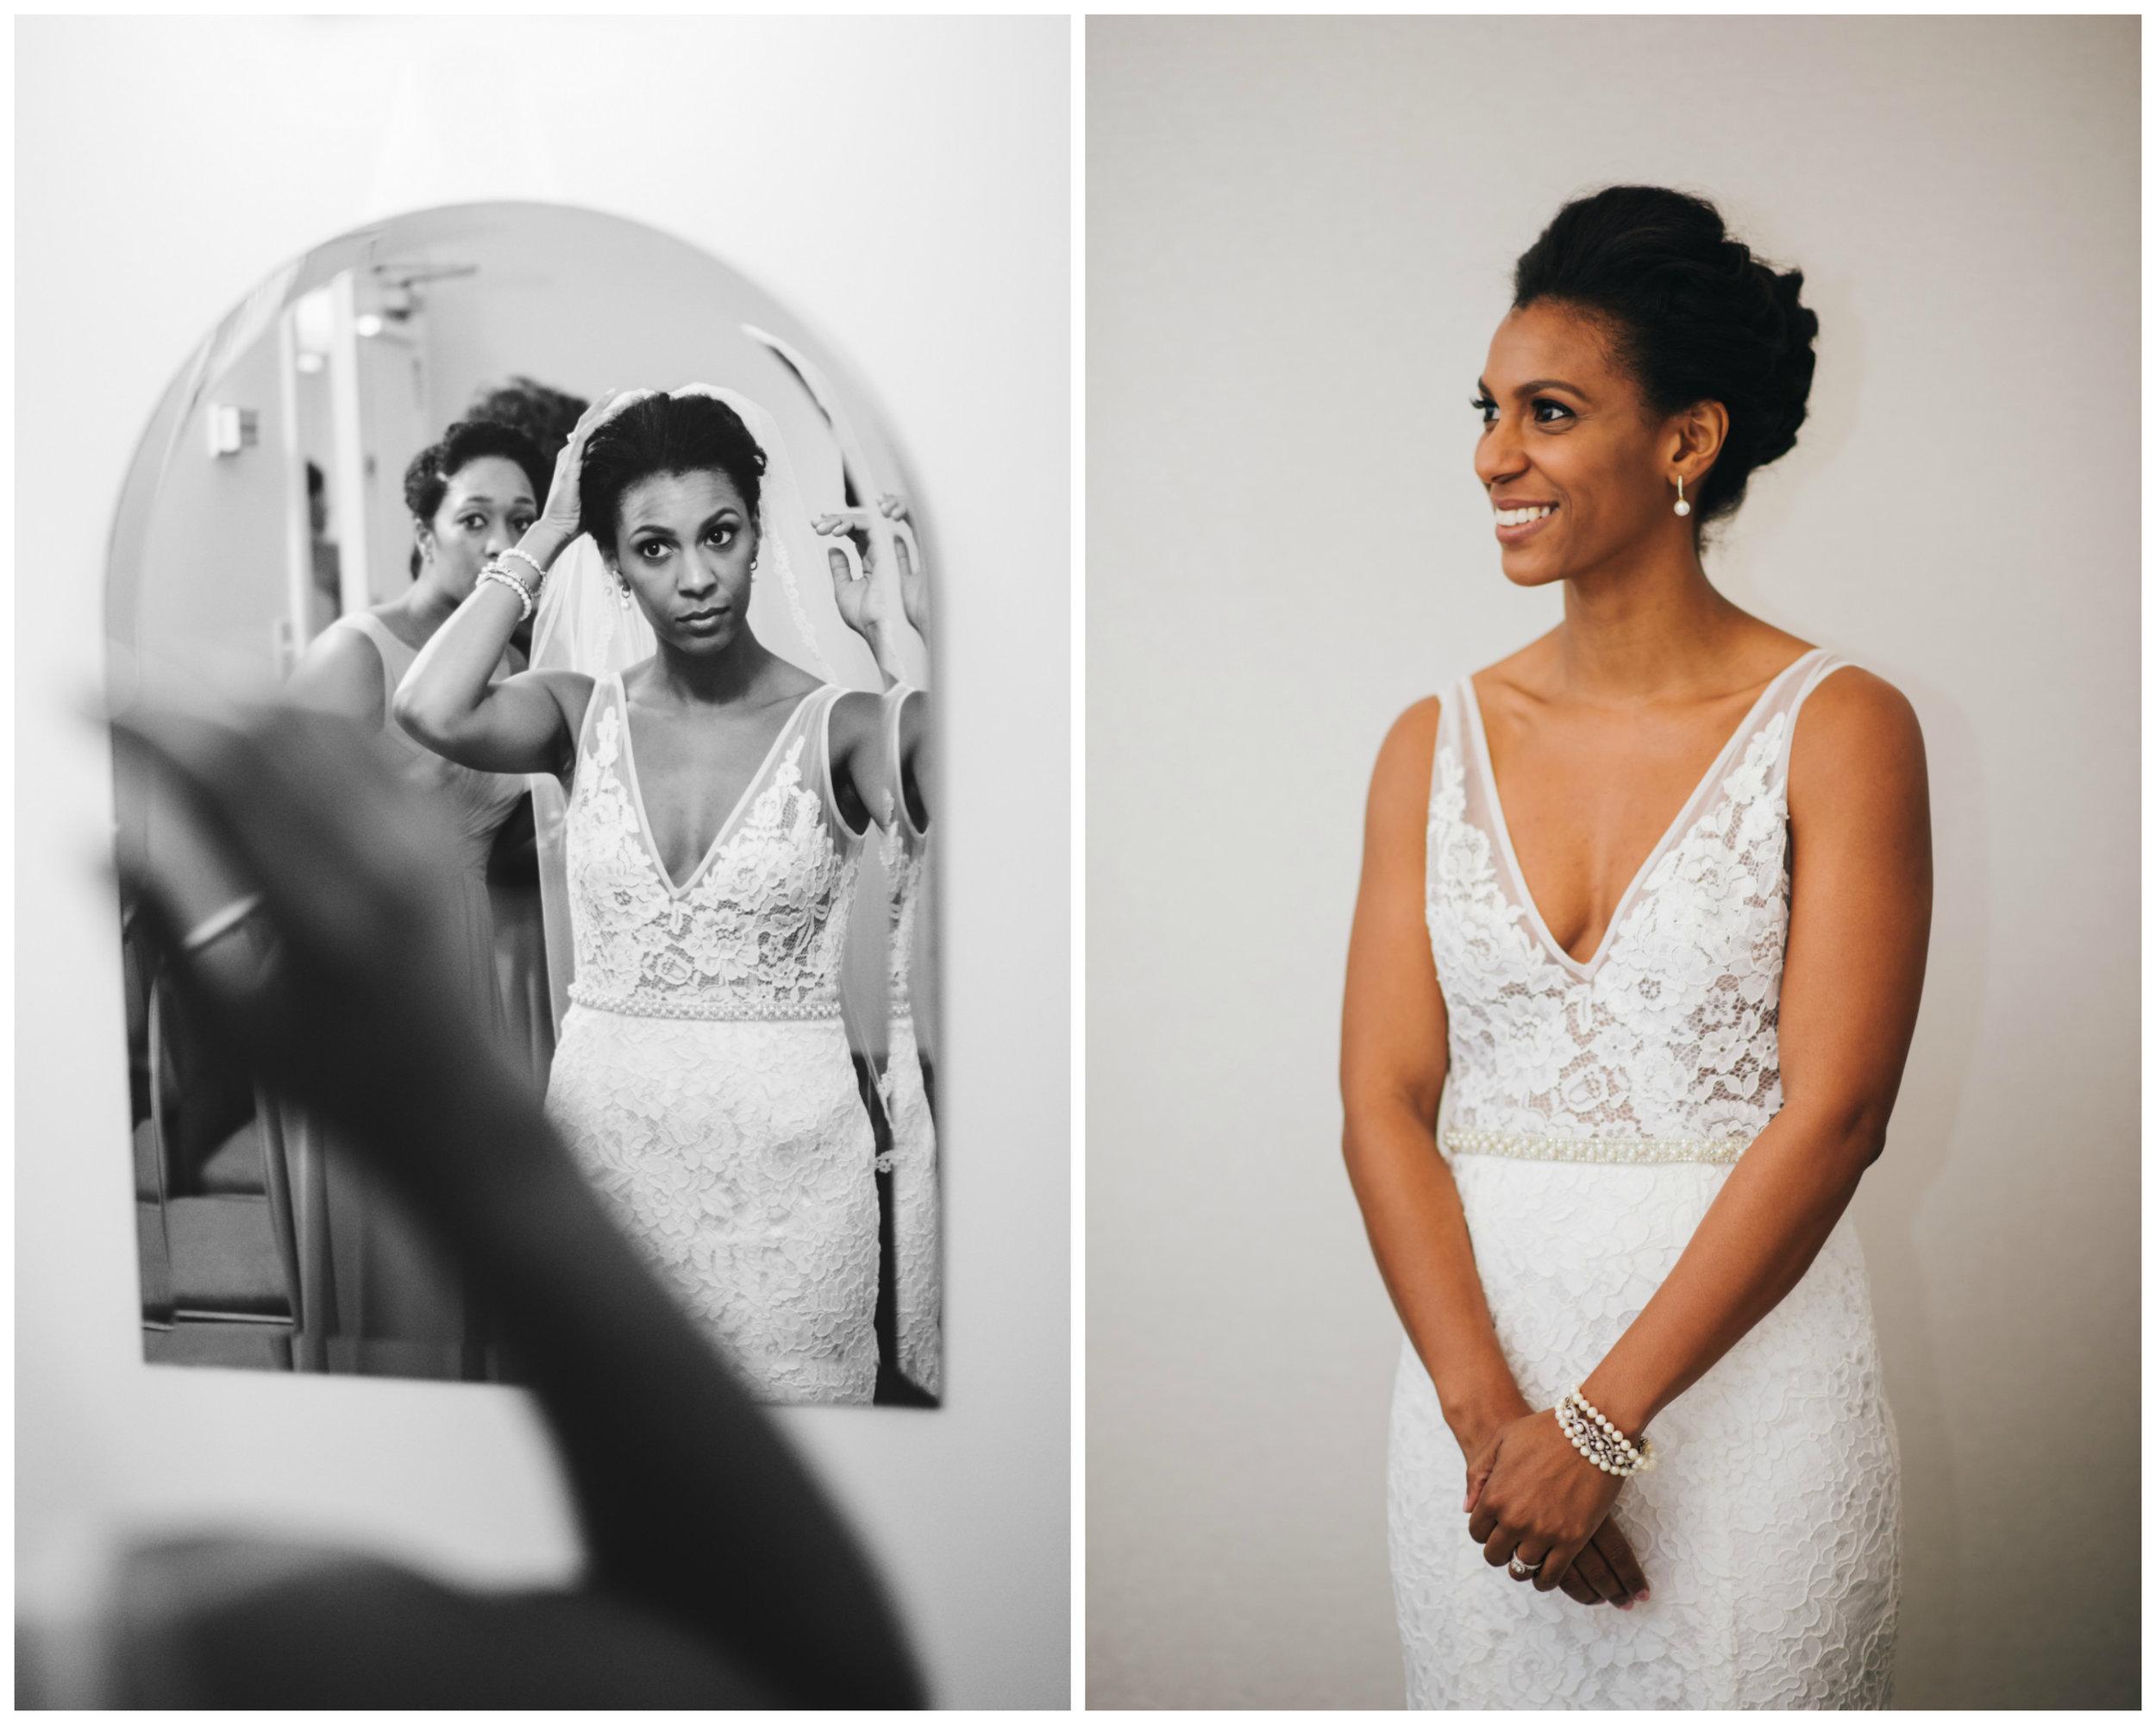 HEDGE ART GALLERY -  EDITORIAL WEDDING PHOTOGRAPHER - CHI-CHI ARI 2.jpg